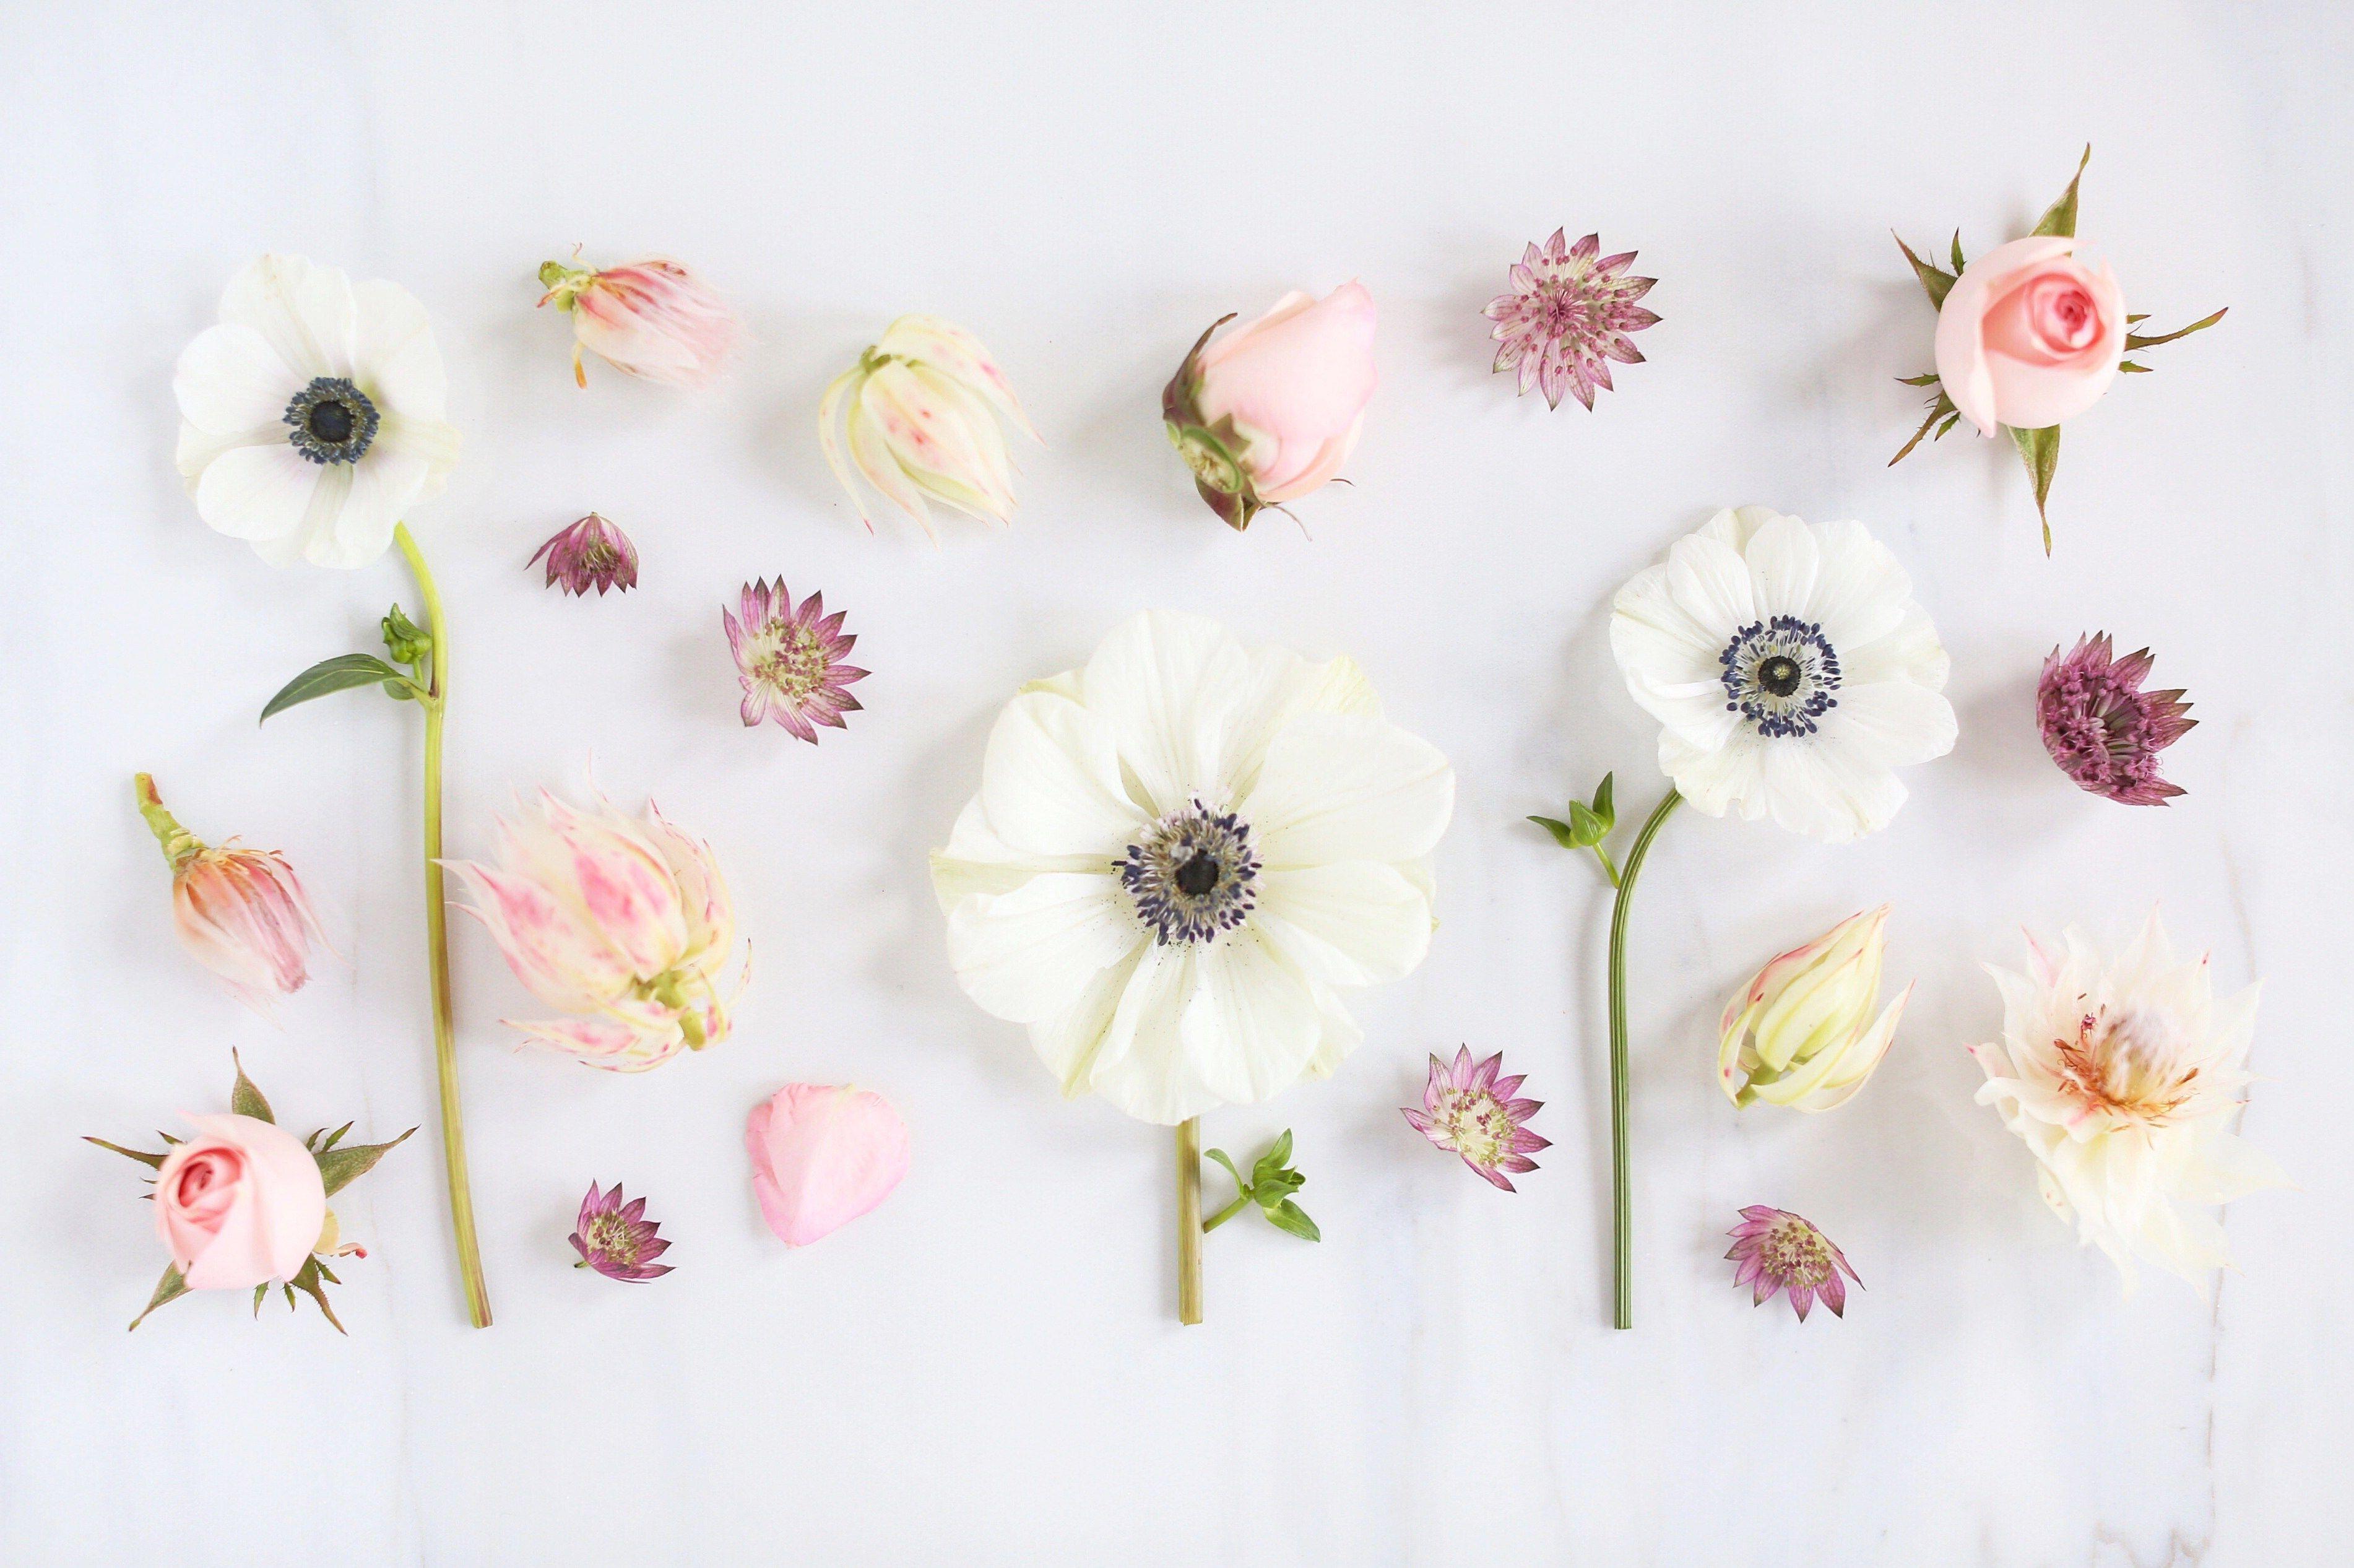 Aesthetic Desktop Wallpaper Flower 3803x2533 Download Hd Wallpaper Wallpapertip